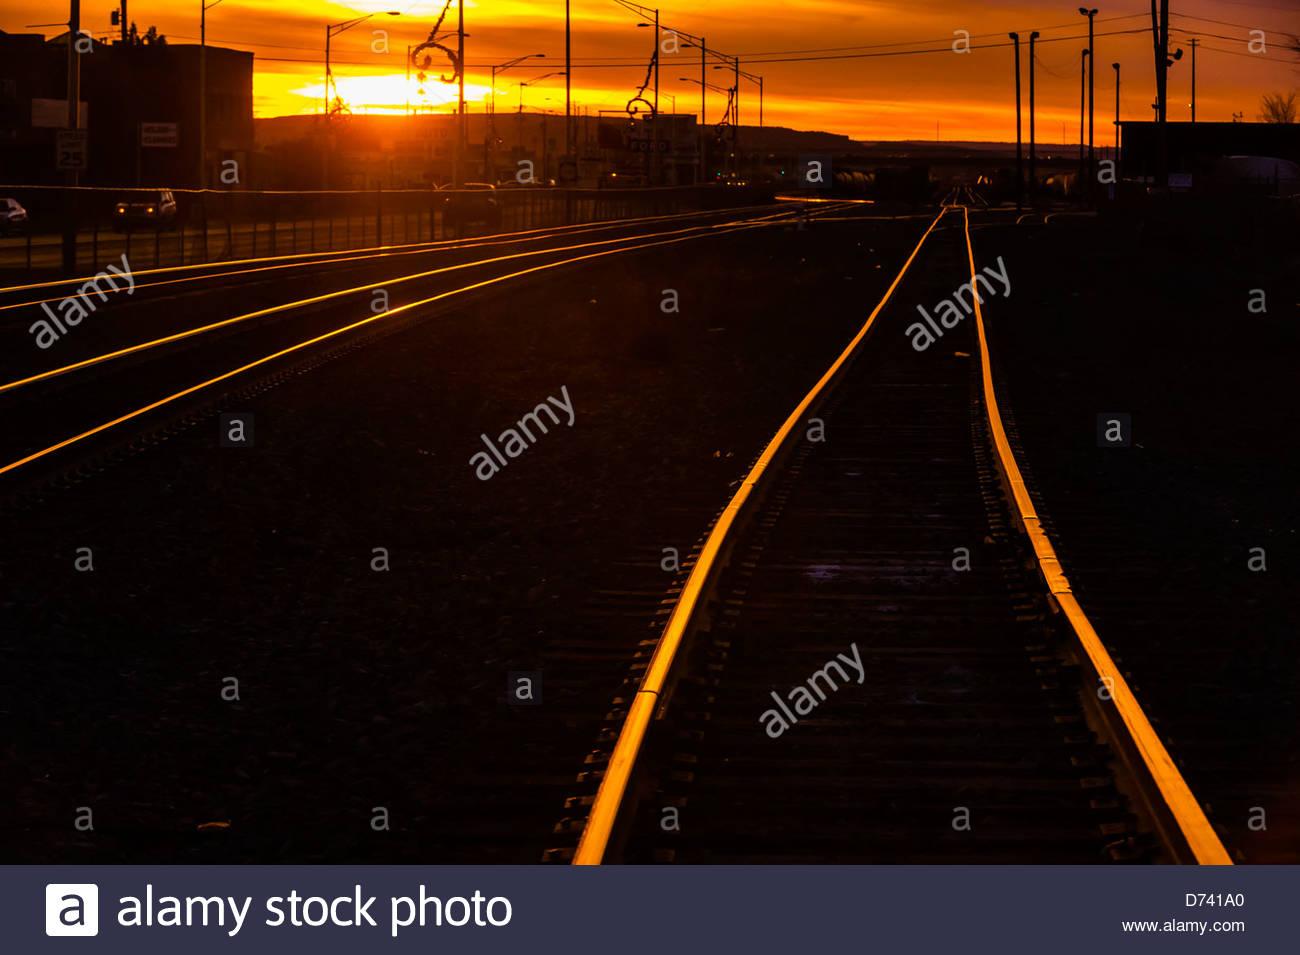 Train tracks at sunset, Gallup, New Mexico USA. Stock Photo